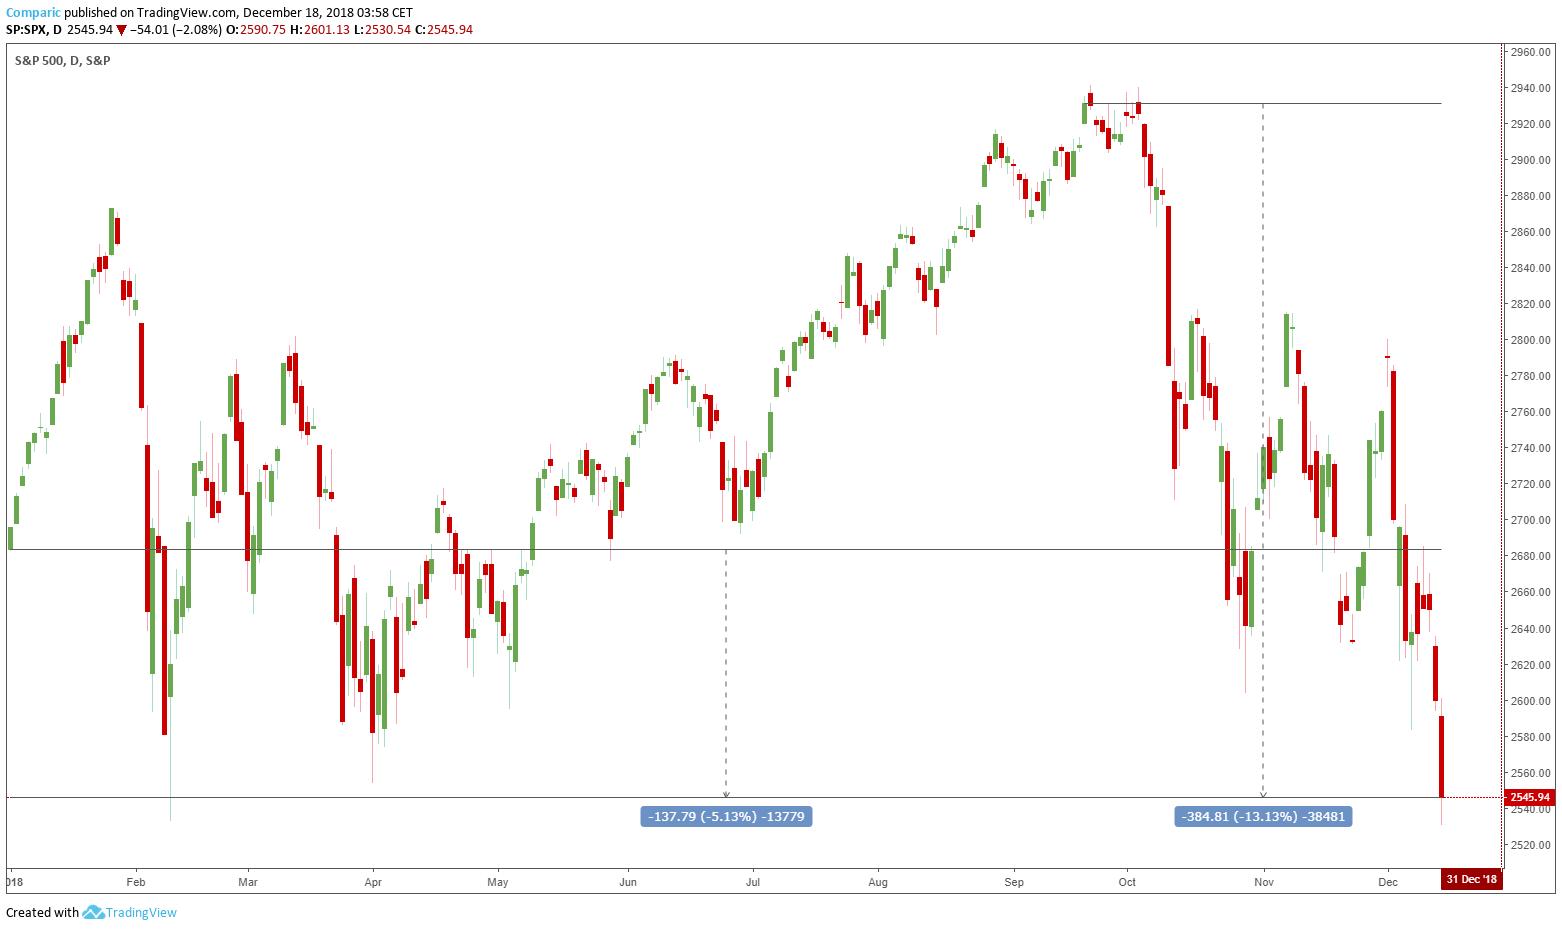 wykres sp500 ytd 18.12.2018